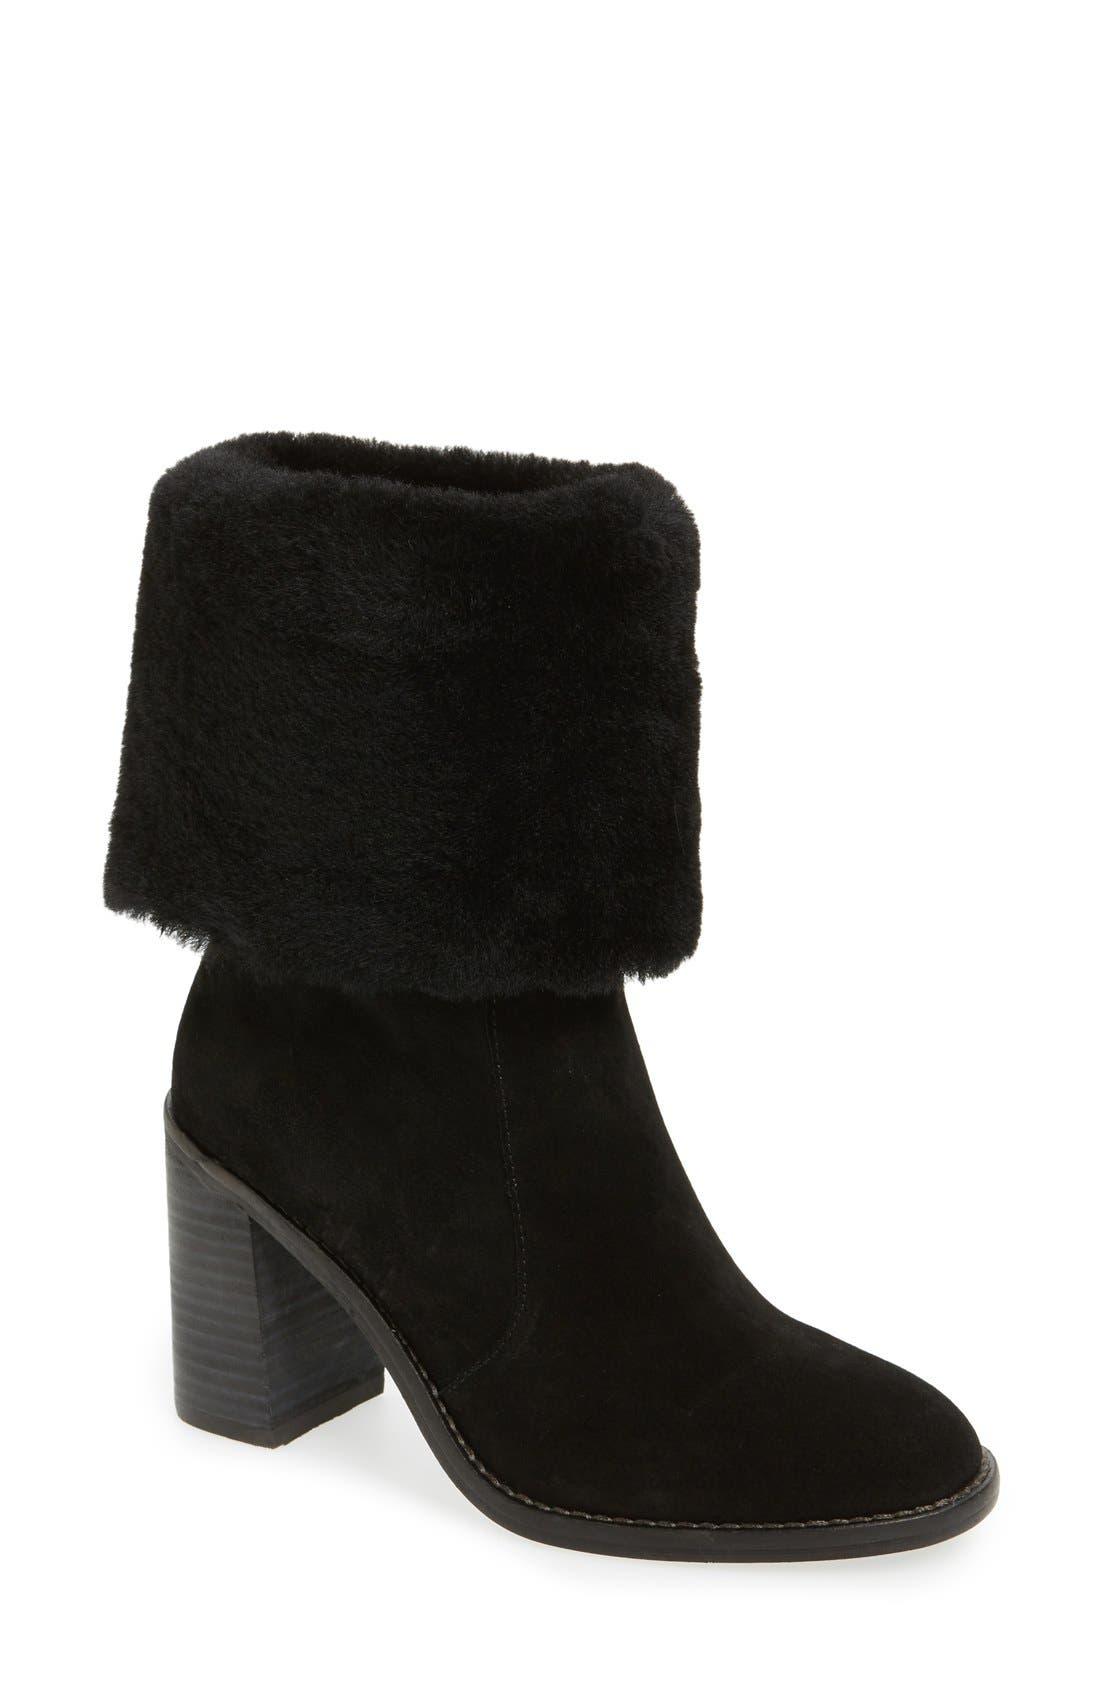 'Maira' Genuine Shearling Cuff Boot,                             Main thumbnail 1, color,                             002